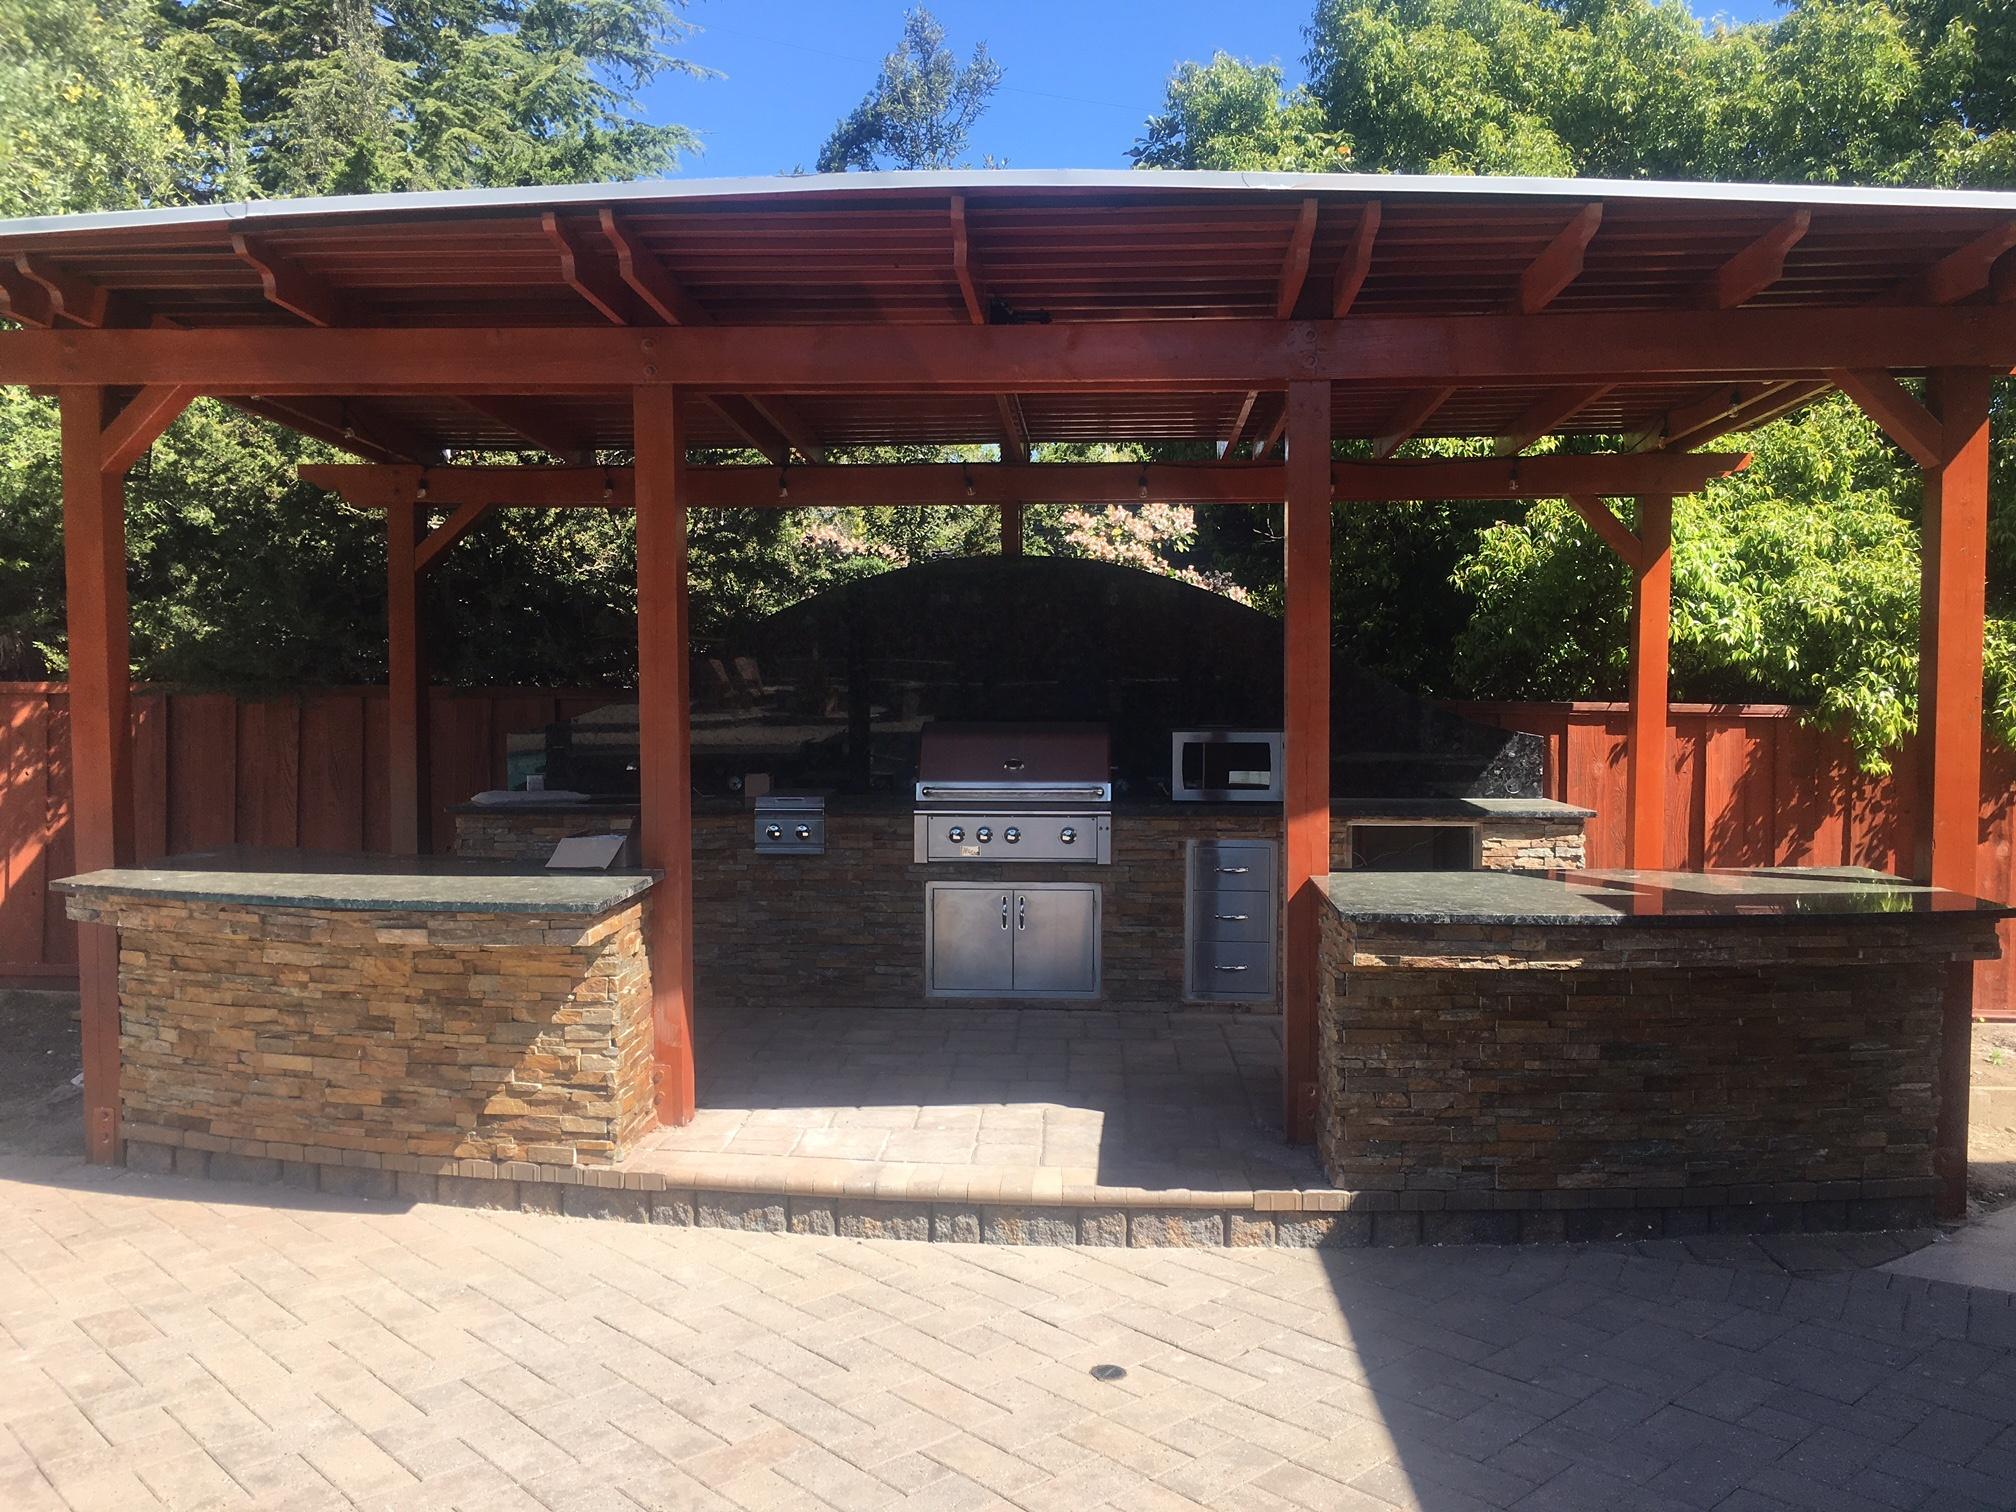 Custom Style Pergola and Outdoor Kitchen - Saratoga, CA